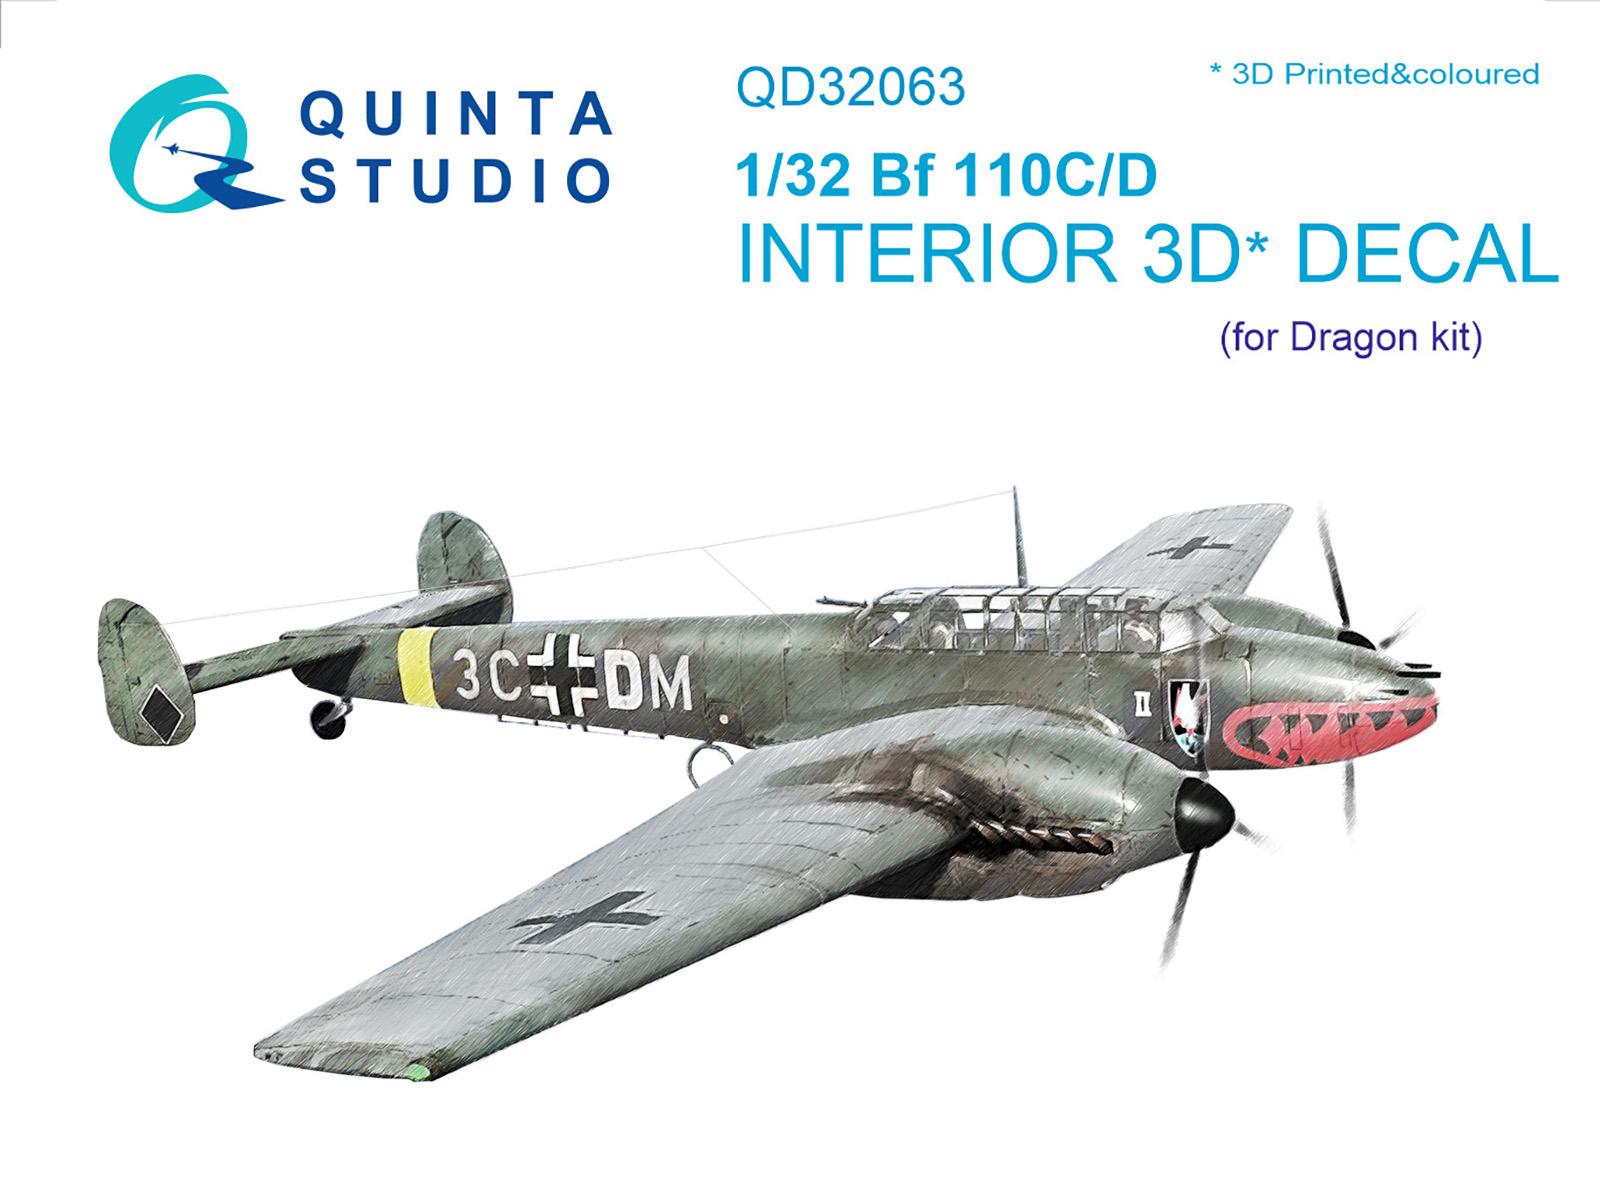 QD32063